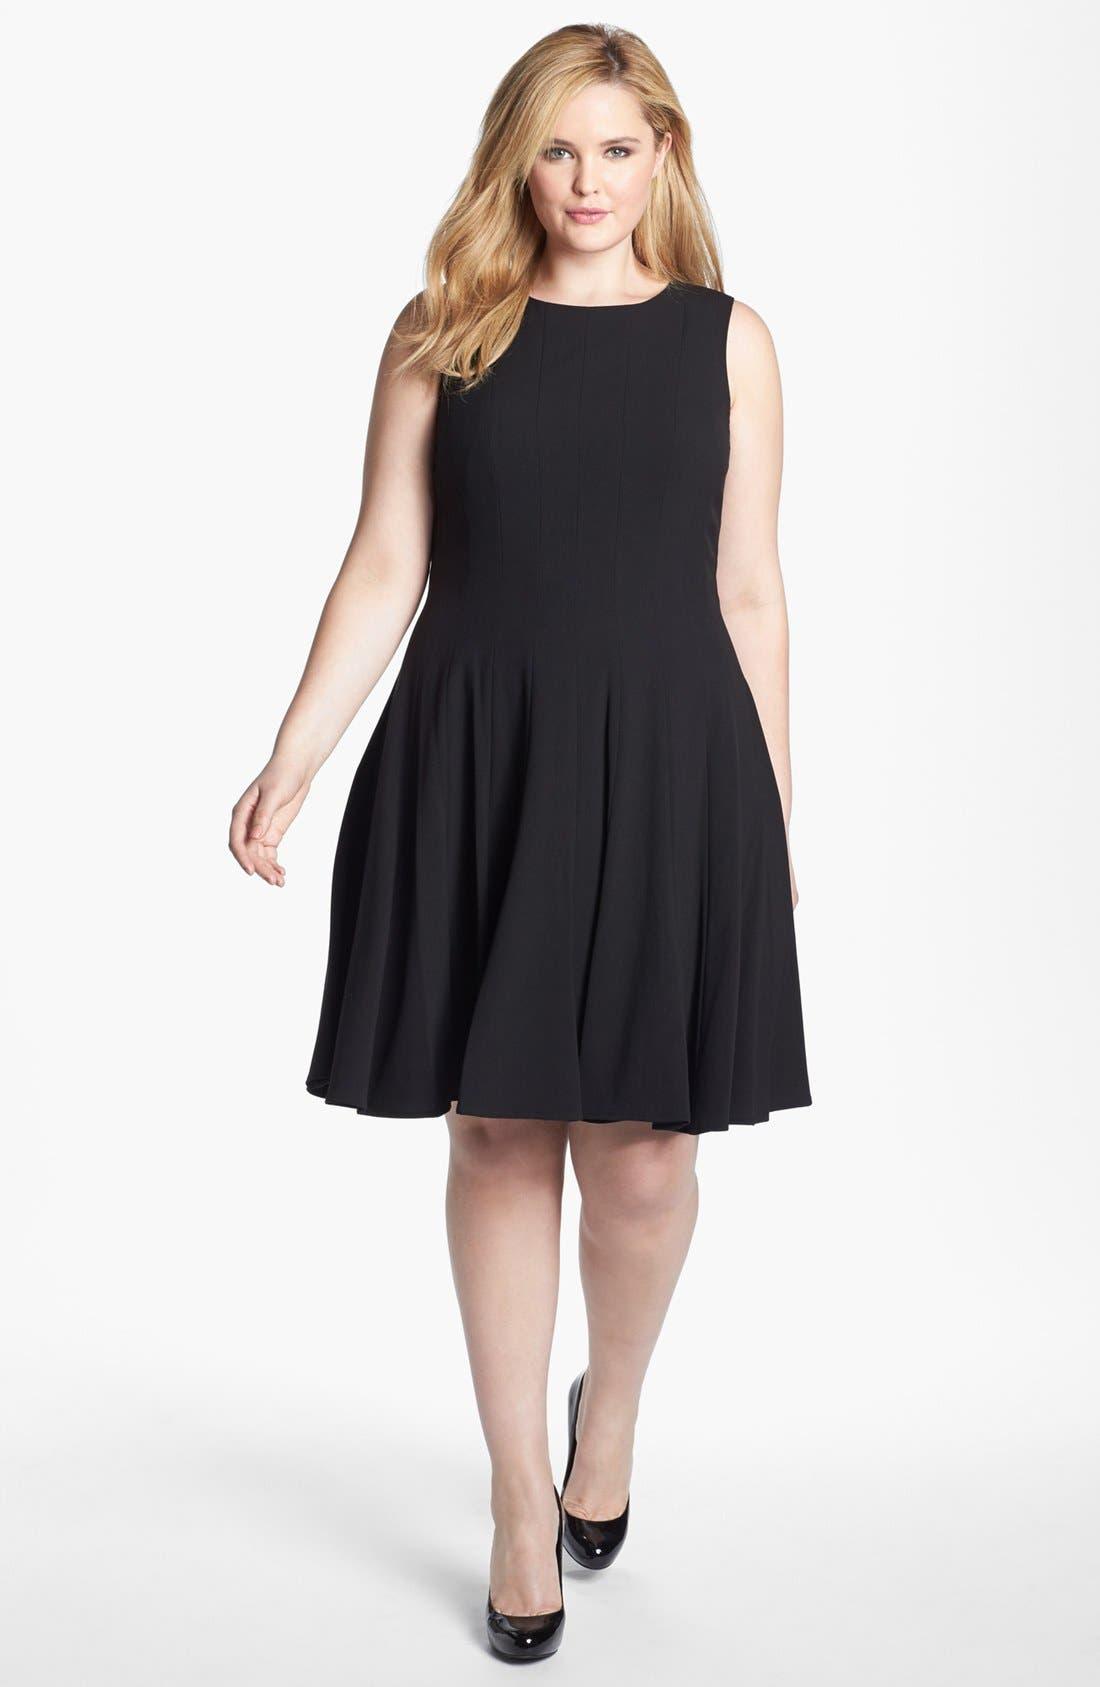 Alternate Image 1 Selected - Calvin Klein Sleeveless Fit & Flare Dress (Plus Size)